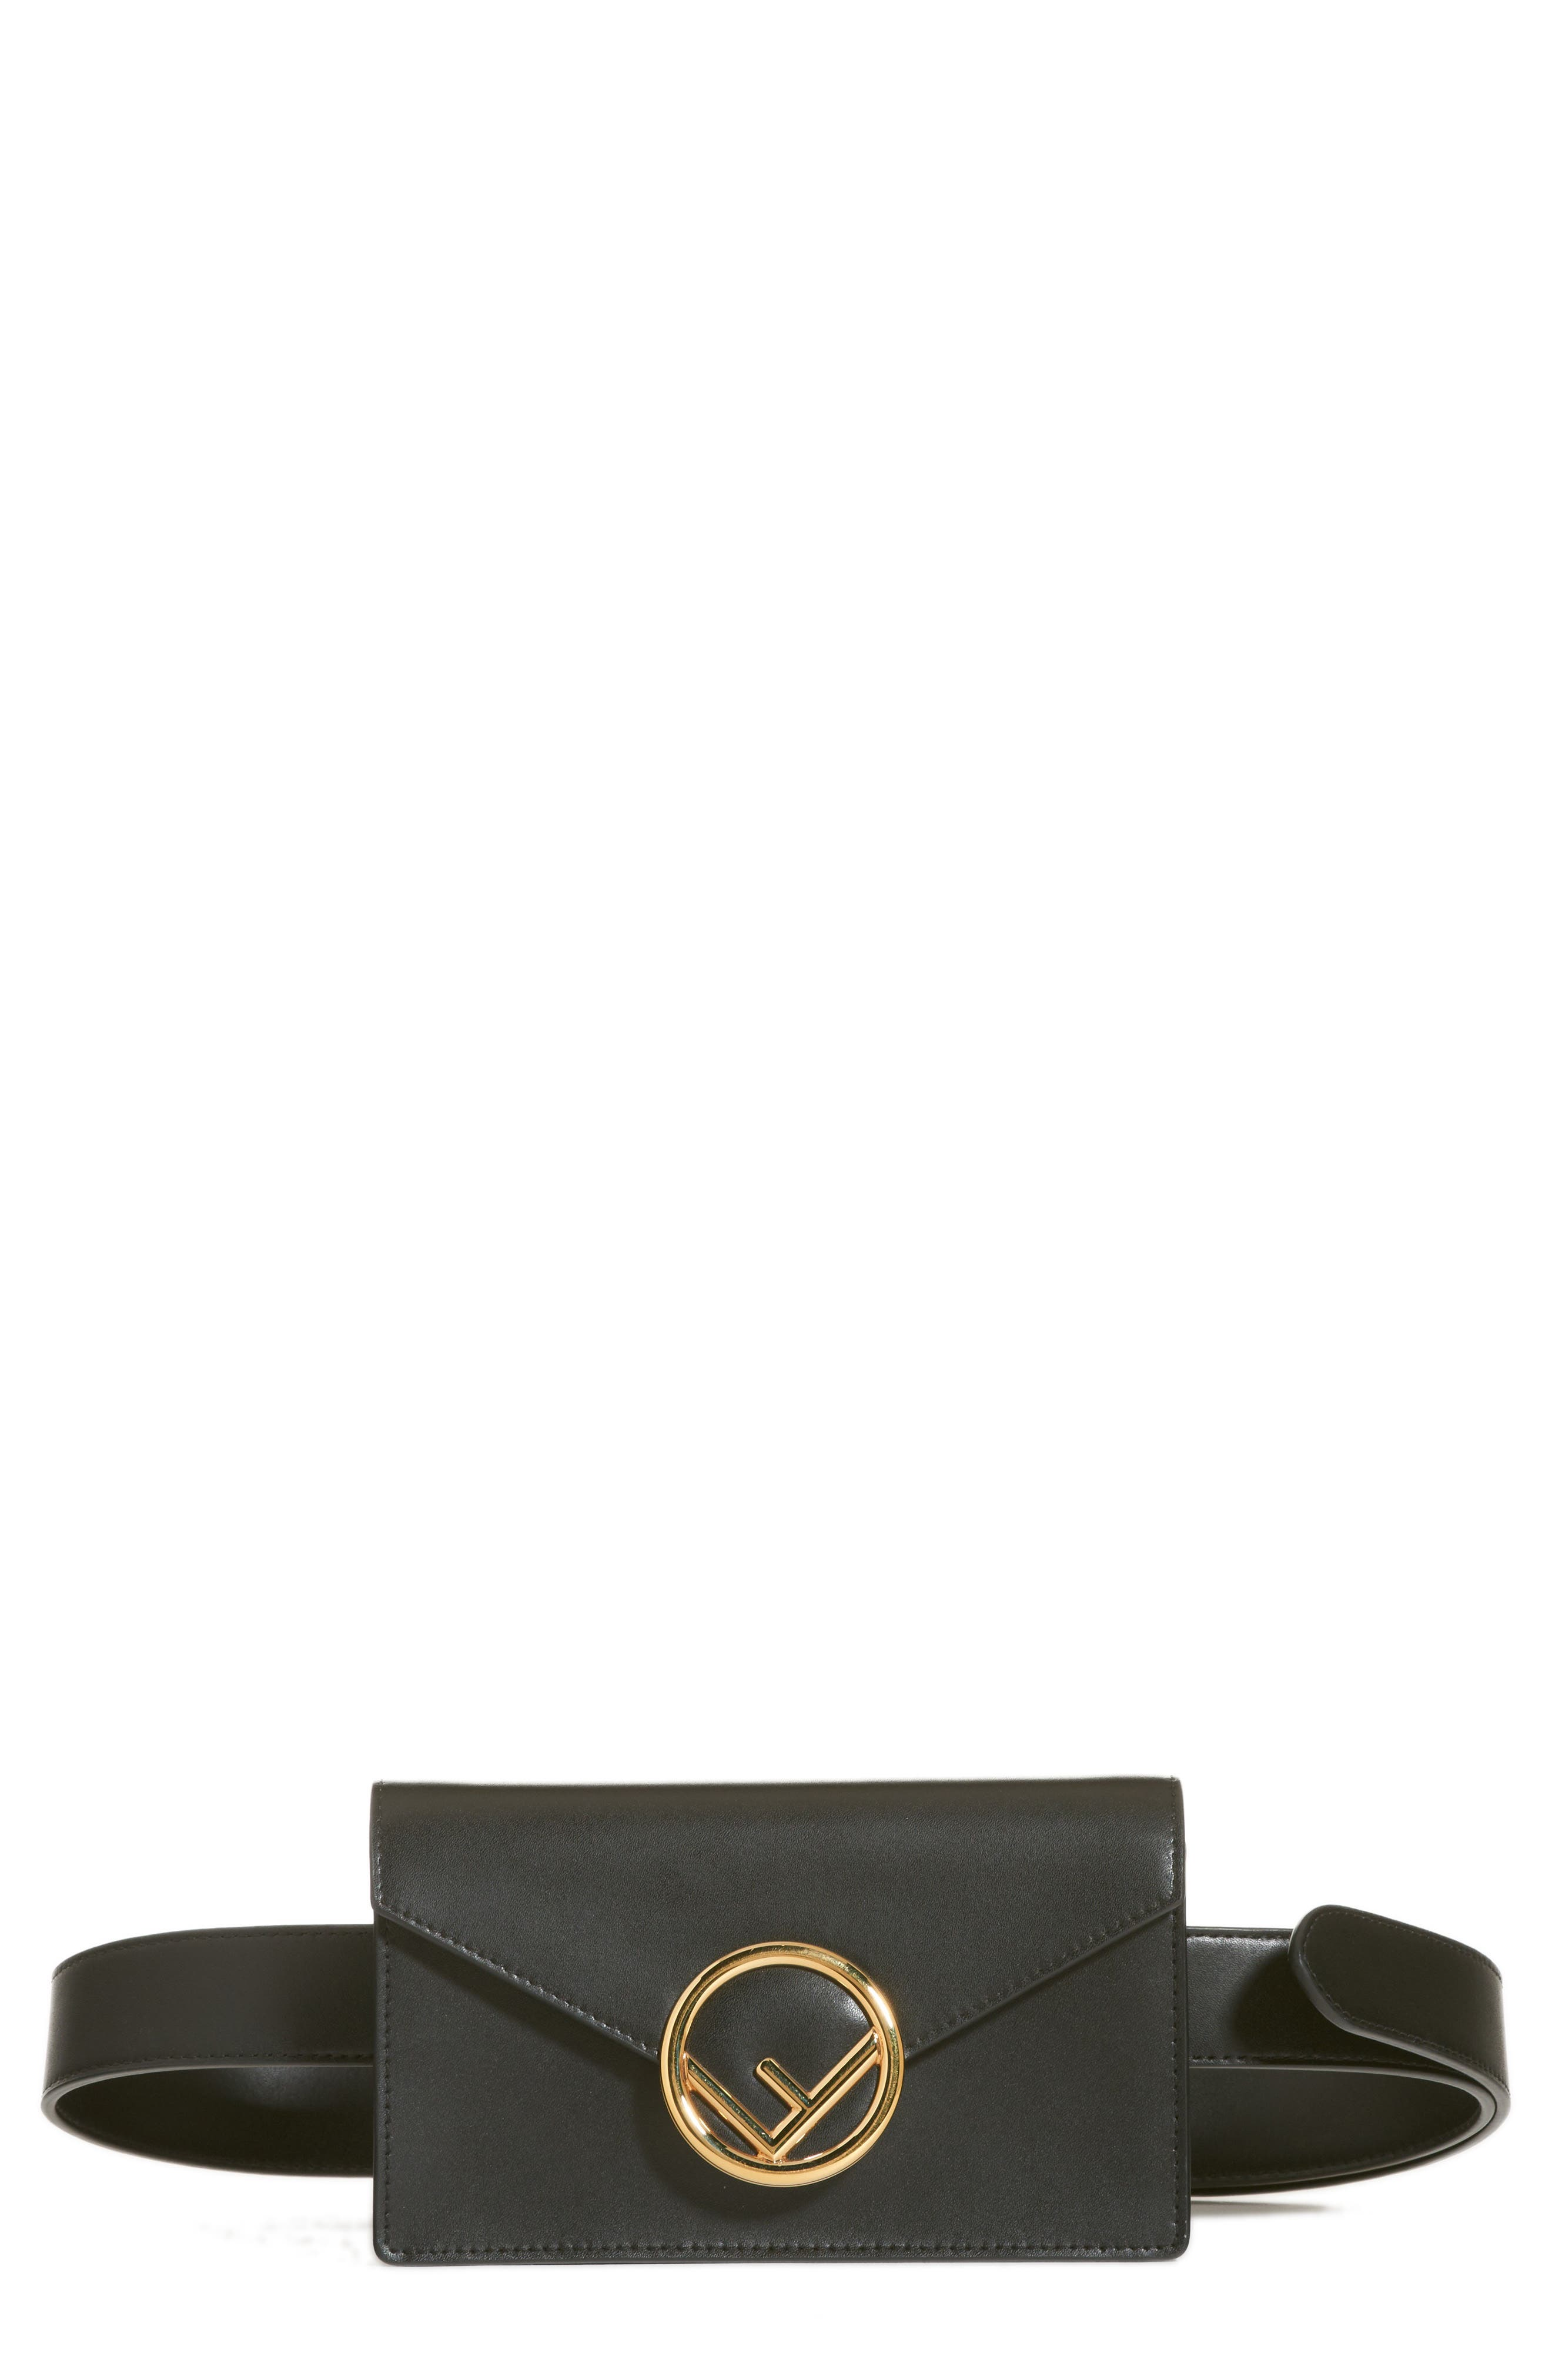 Liberty Logo Calfskin Leather Belt Bag,                             Main thumbnail 1, color,                             NERO/ ORO SOFT